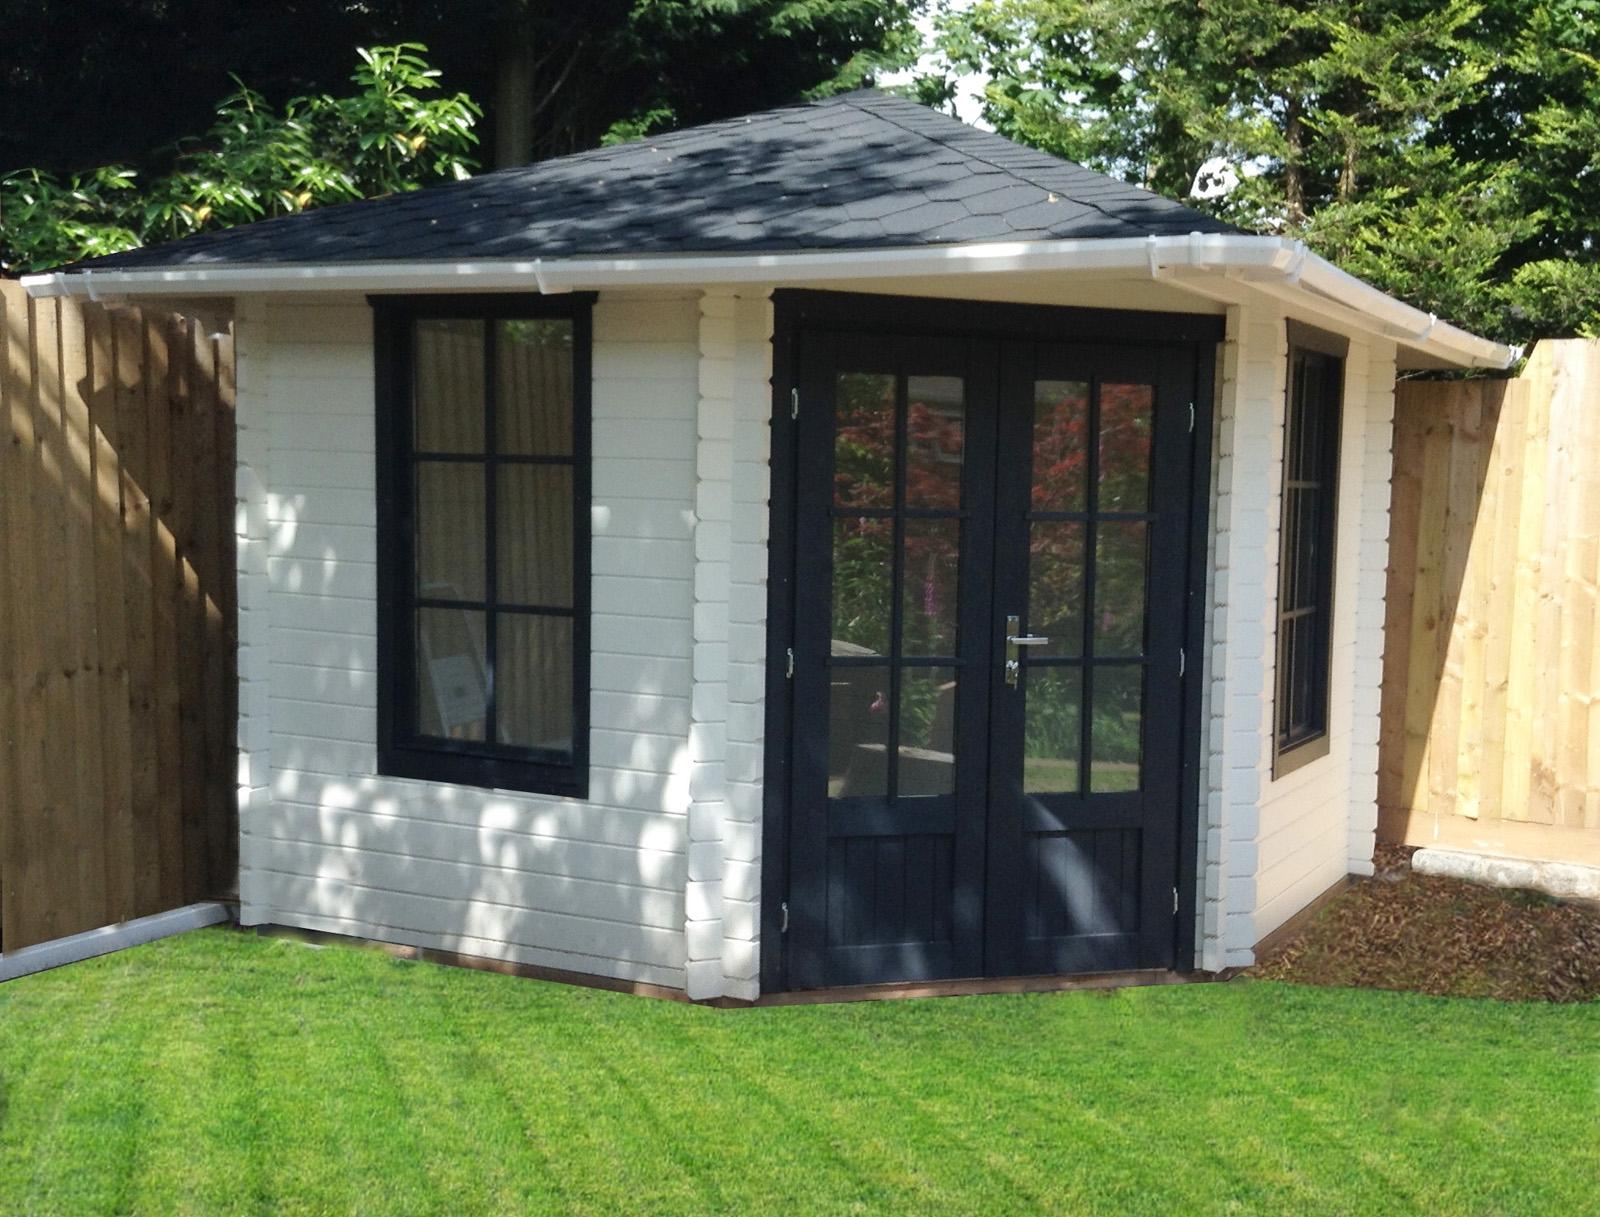 gartenhaus 5 eck blockhaus ger tehaus holz 300x300 28mm 283929. Black Bedroom Furniture Sets. Home Design Ideas